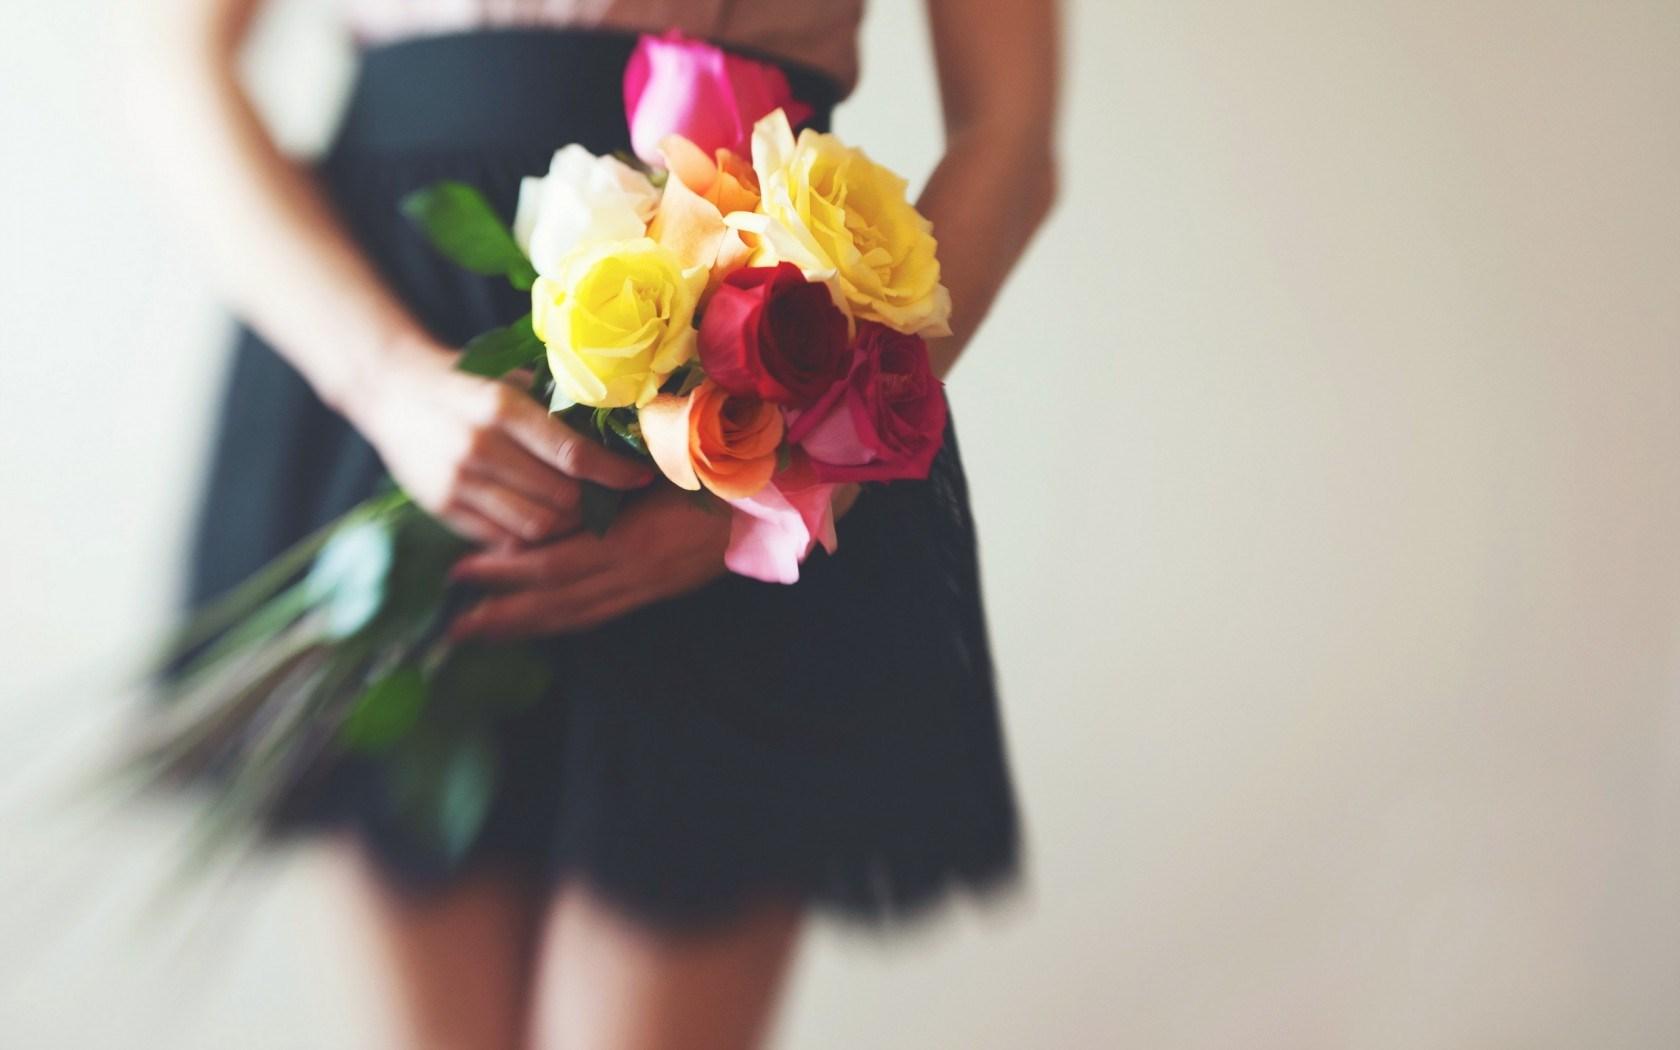 Фото девушек без лица с цветами на аву с короткими волосами